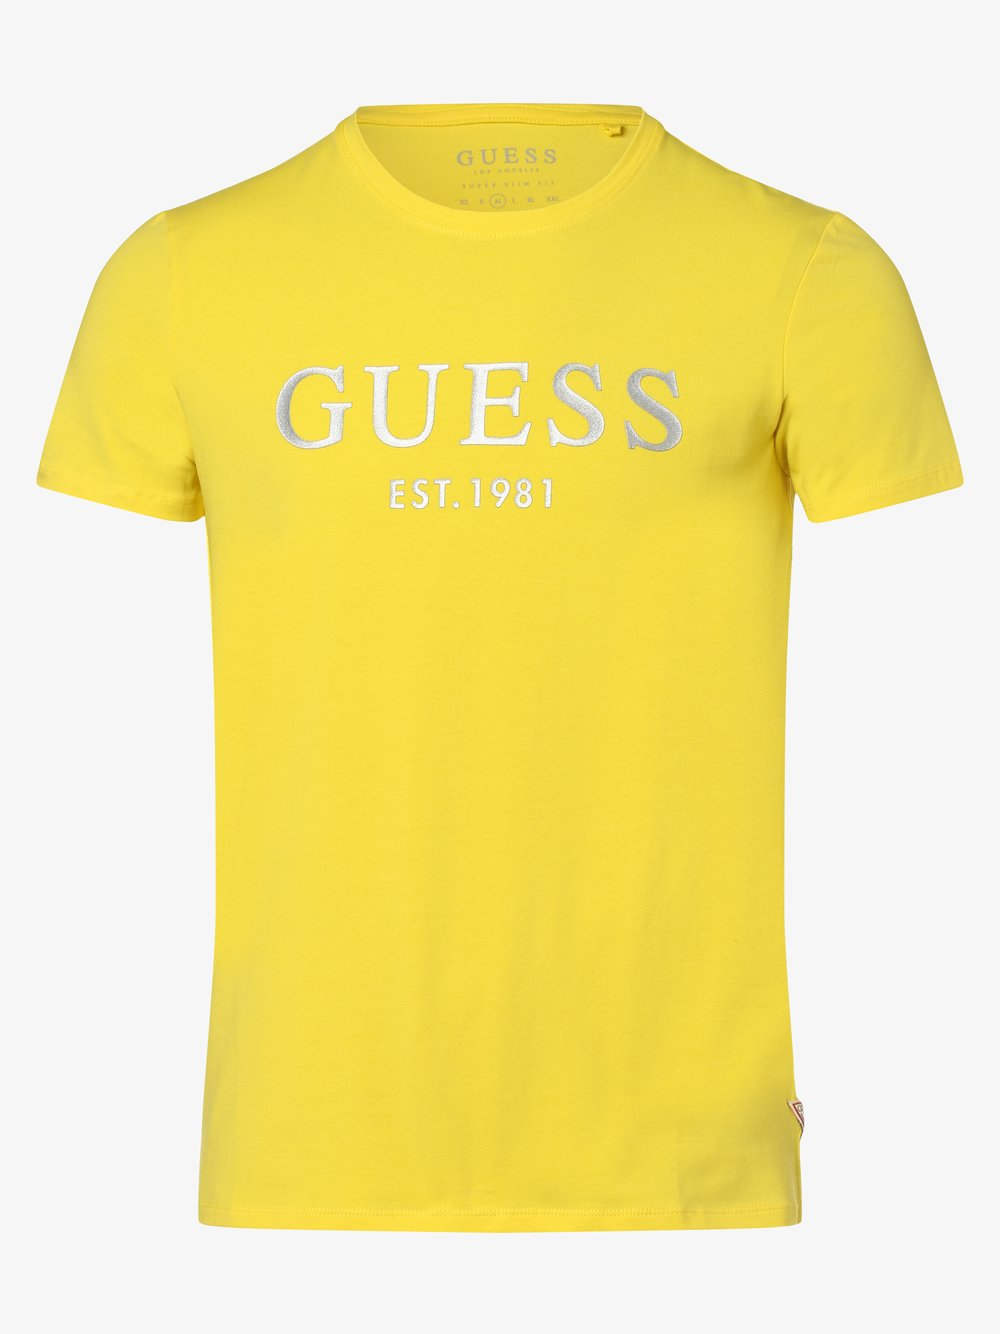 Guess Jeans - T-shirt męski, żółty